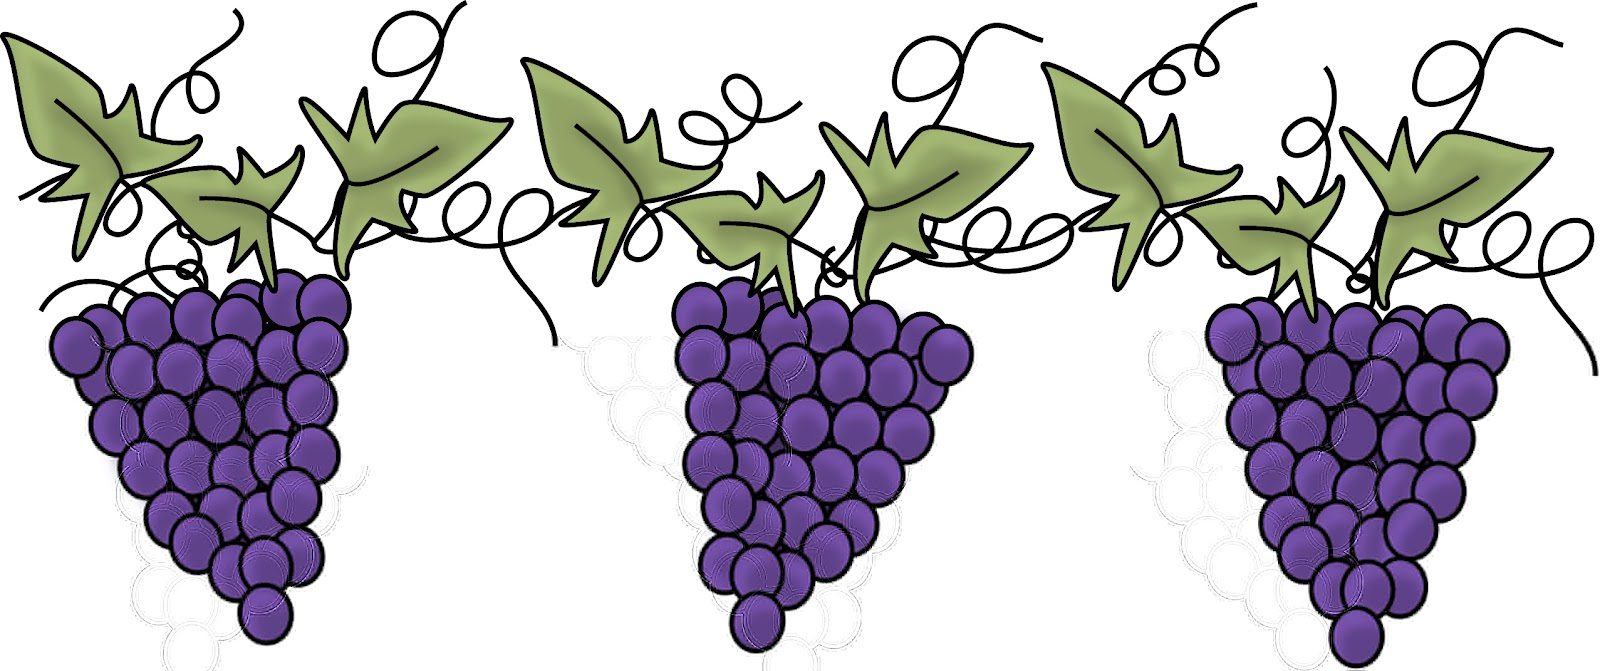 Grapevine Border - ClipArt Best